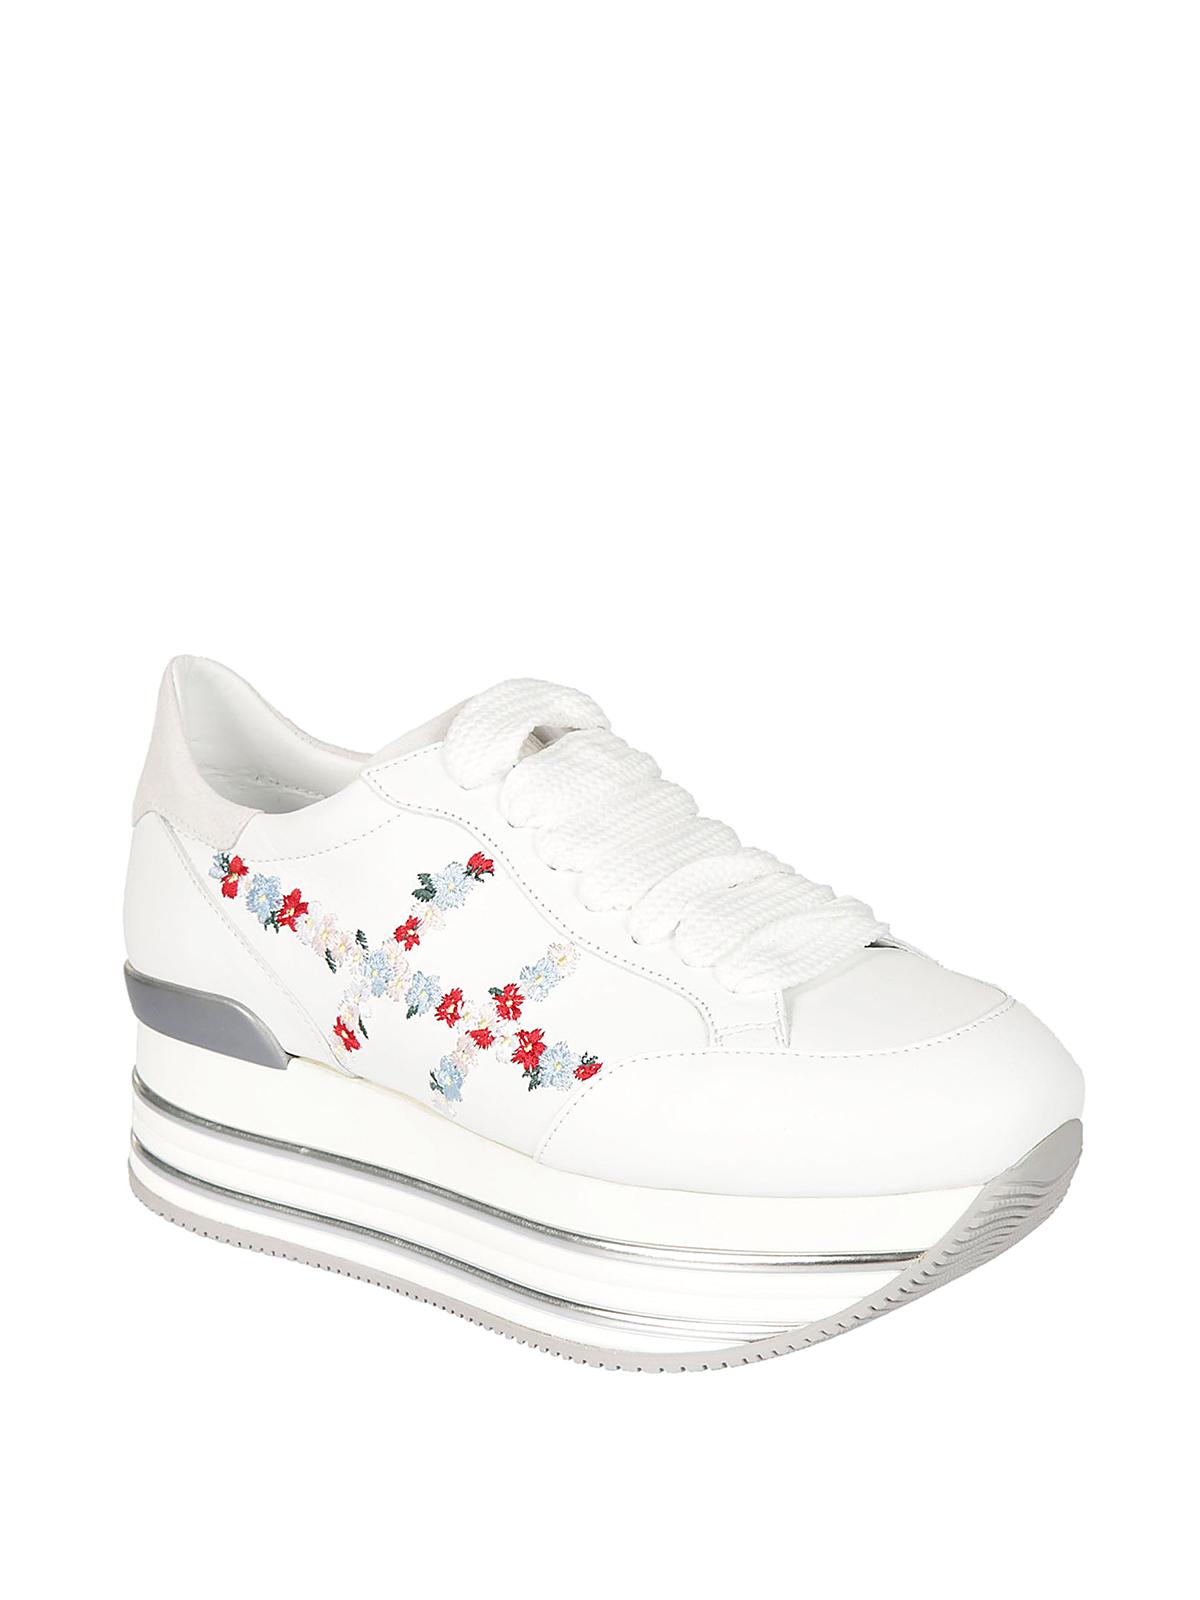 Trainers Hogan - Maxi H222 flowers H sneakers - HXW3460AC90I78B001